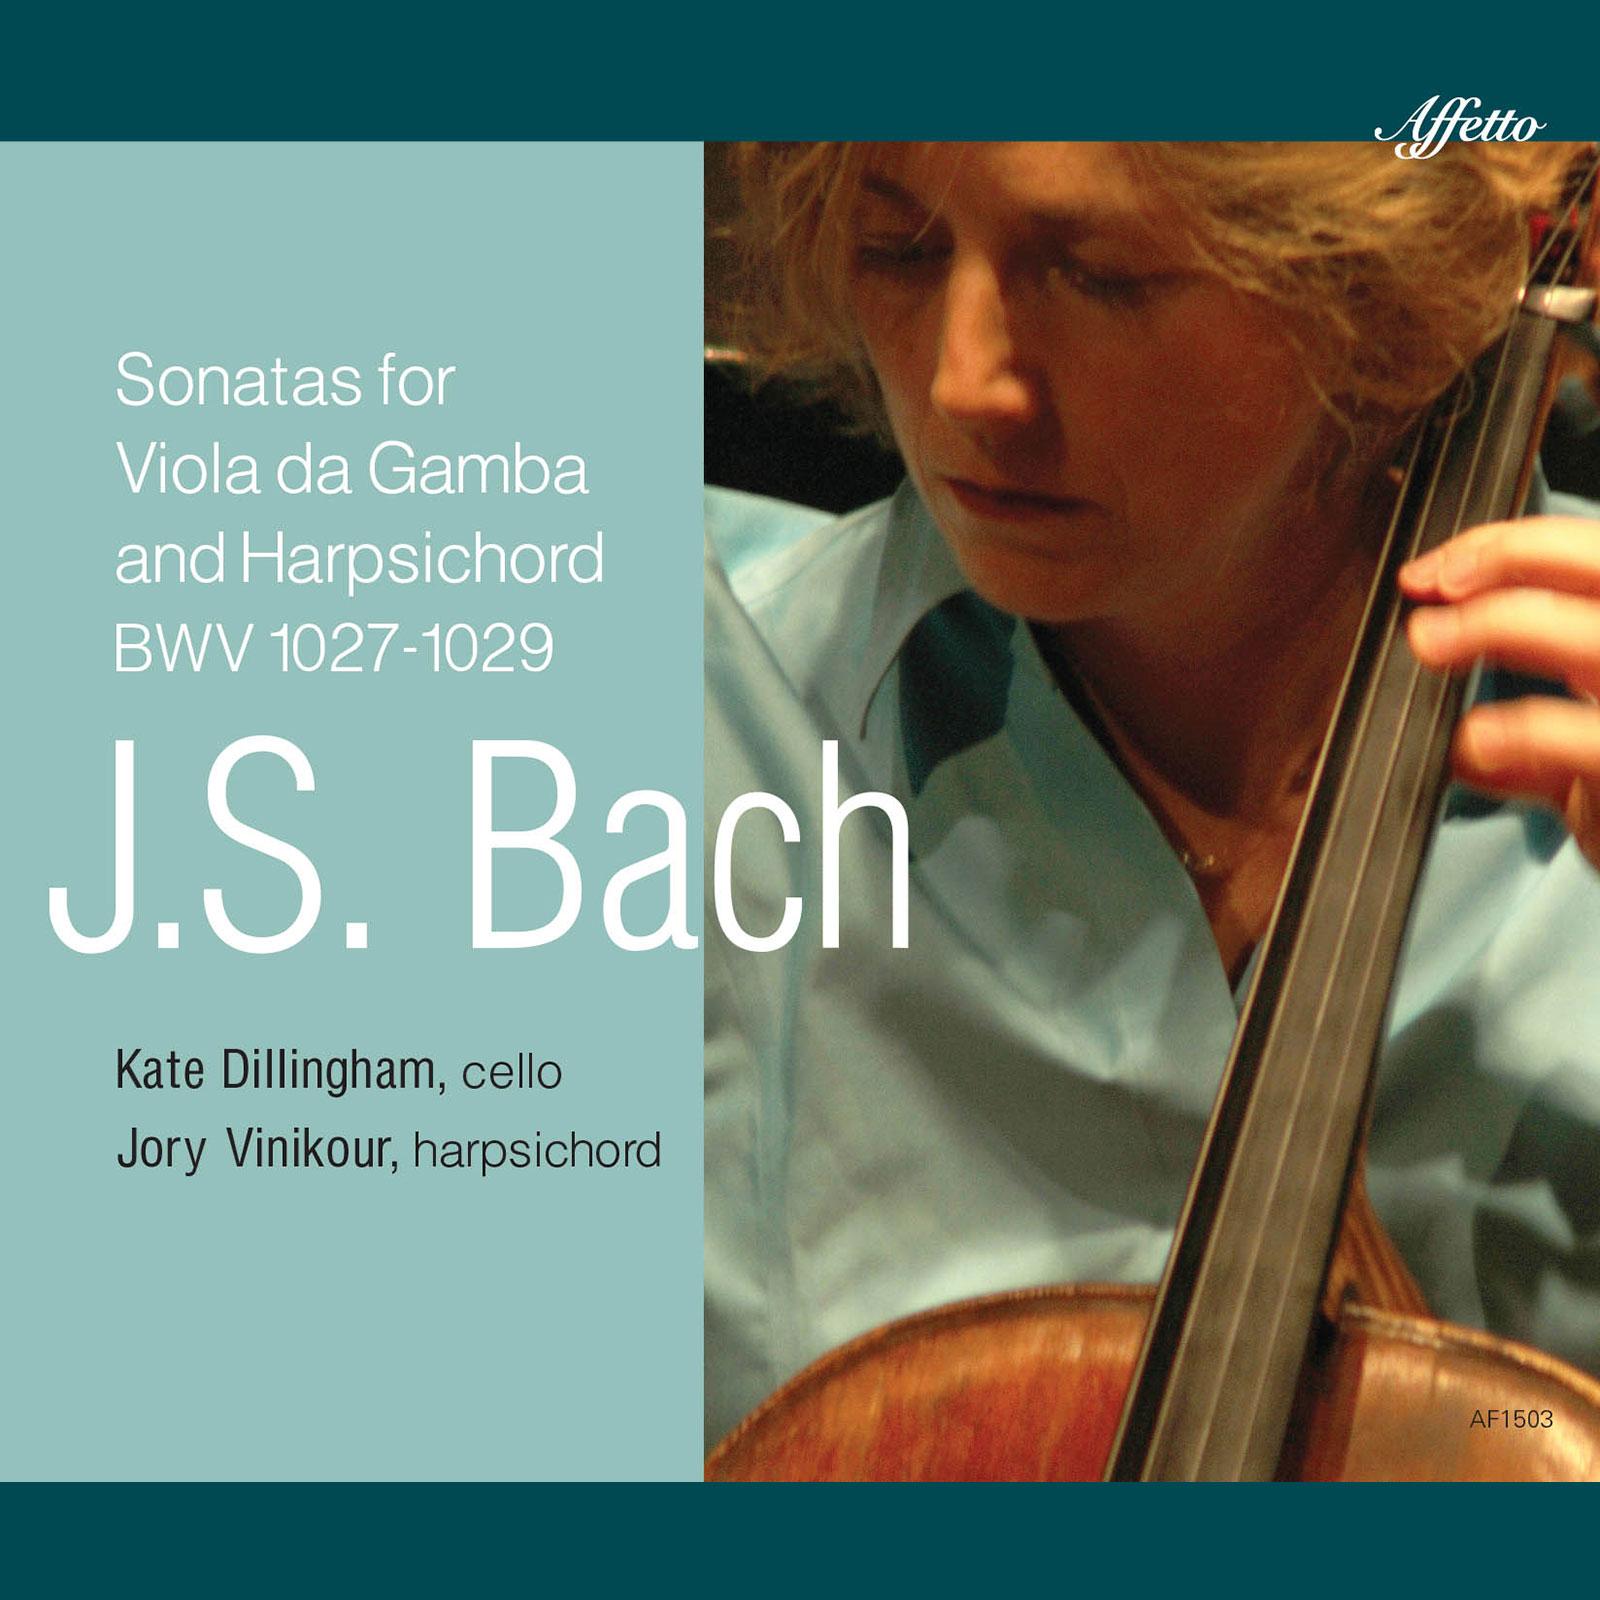 J.S. Bach Three Sonatas for Viola da Gamba and Harpsichord, BWV 1027-1029